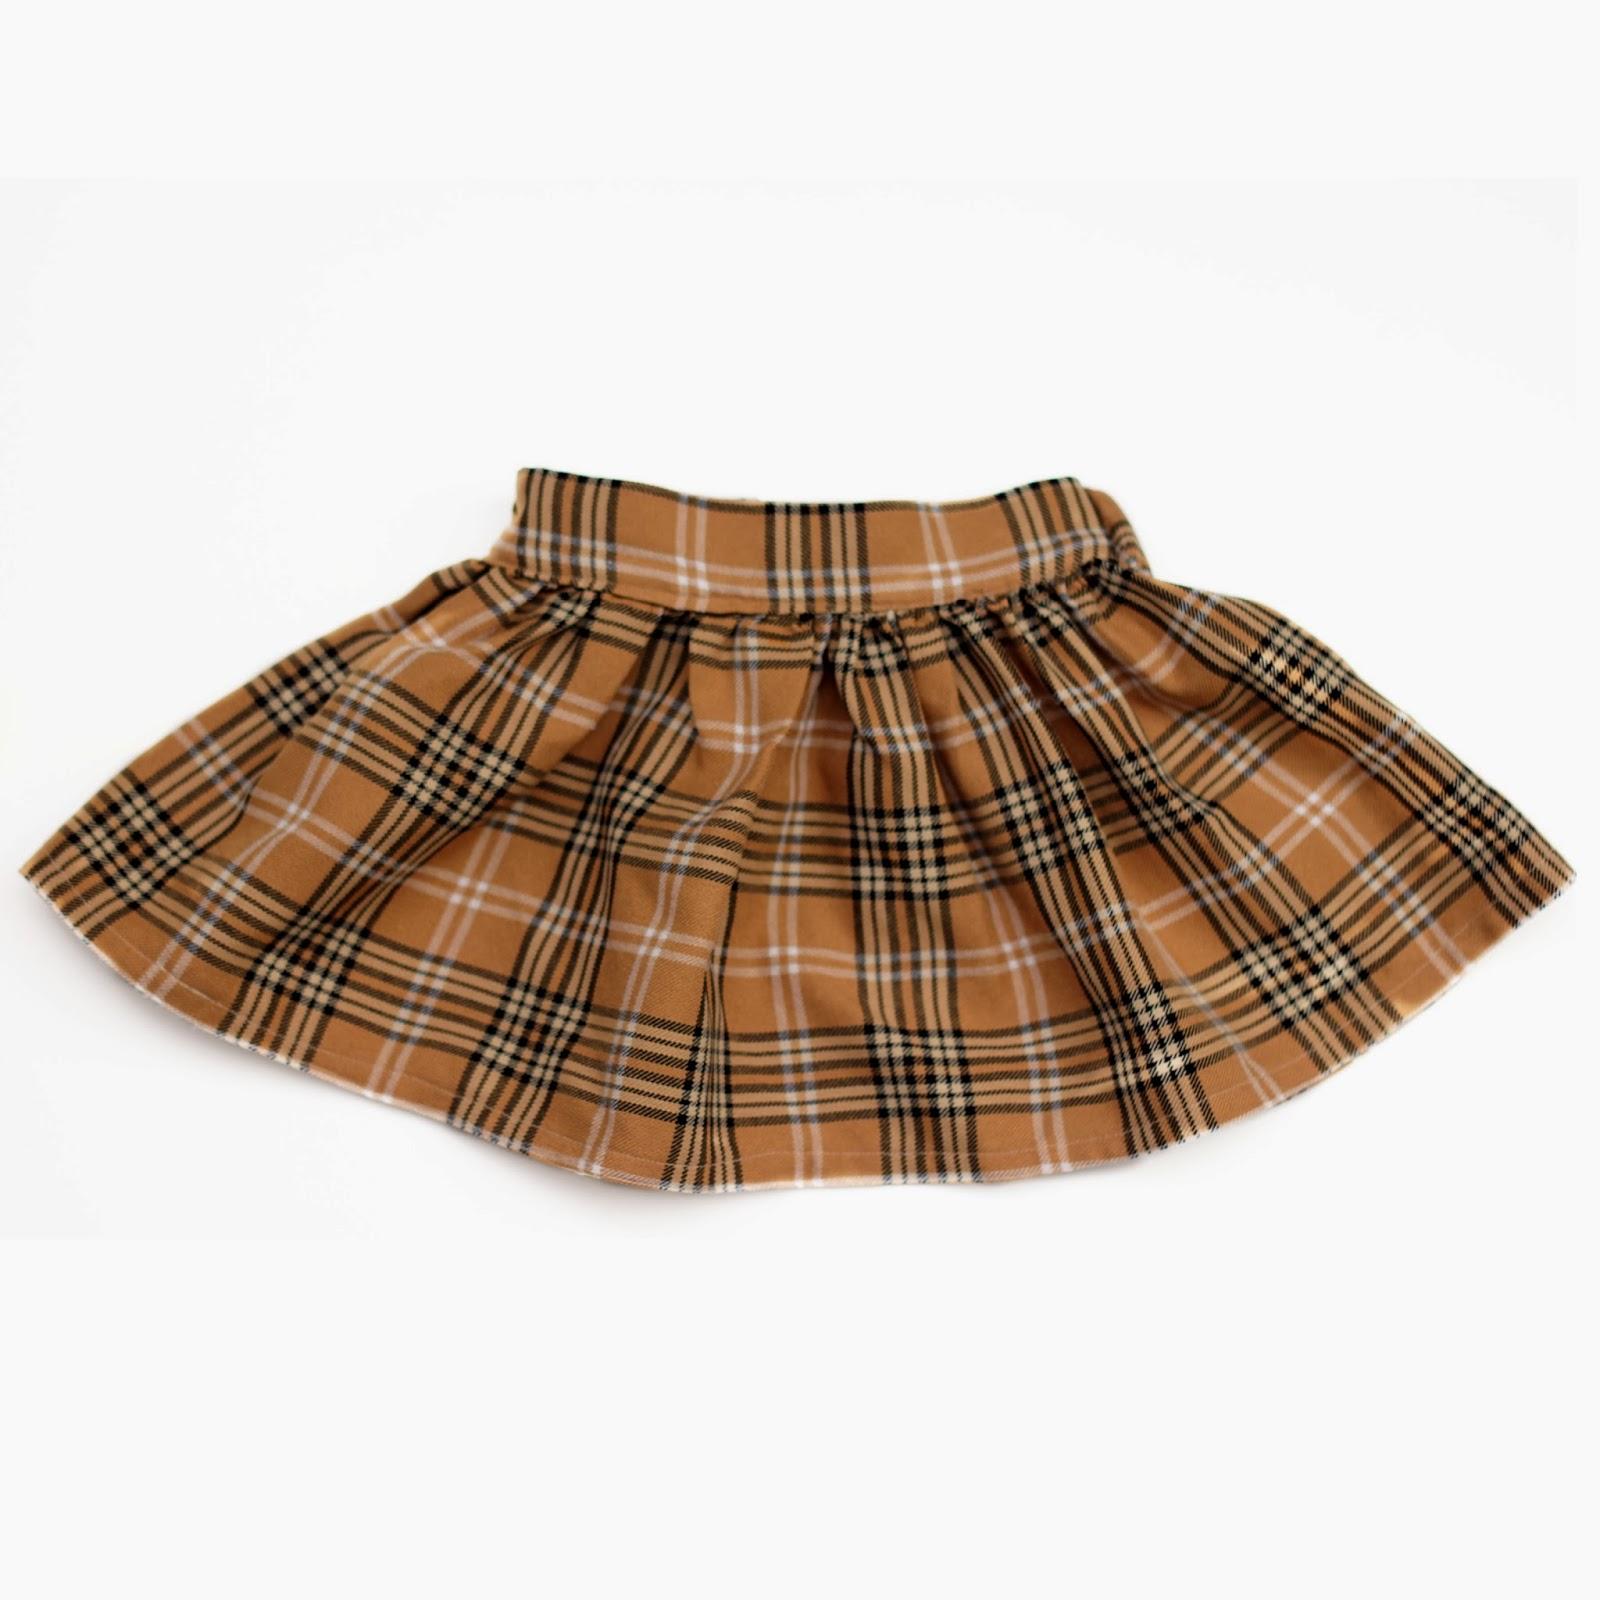 Flat front back elastic skirt